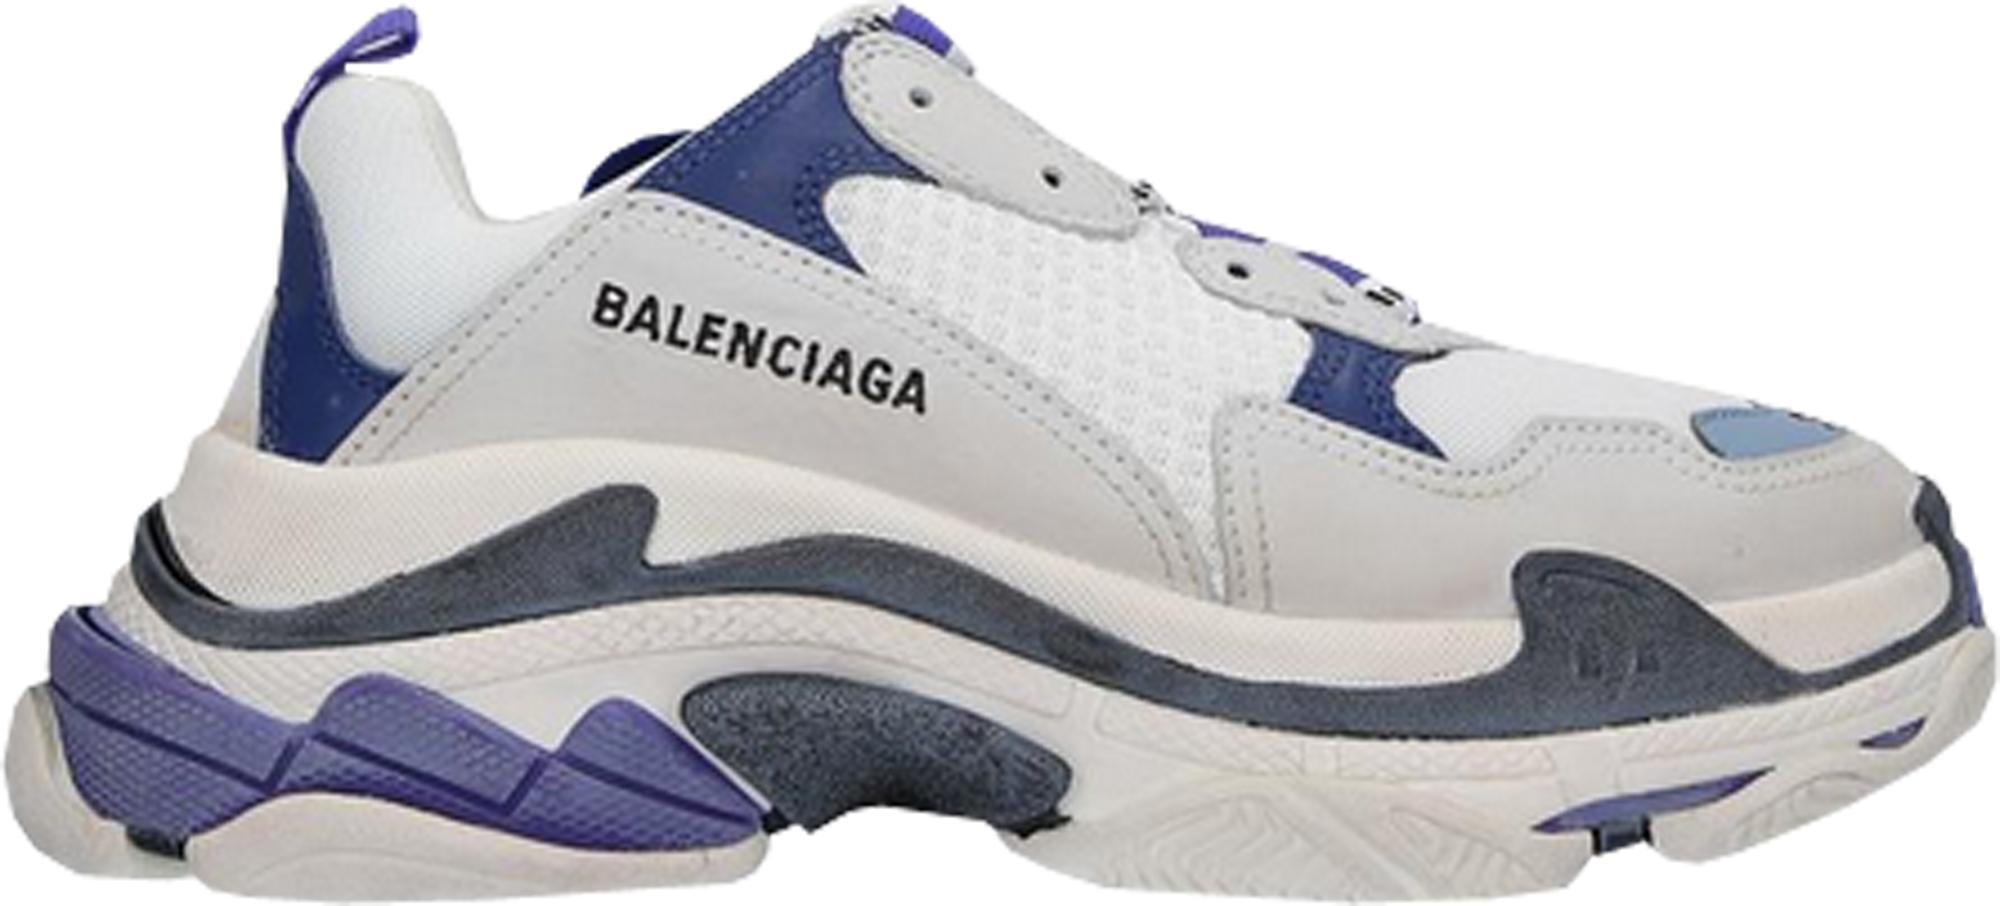 Balenciaga Triple S White Purple (W